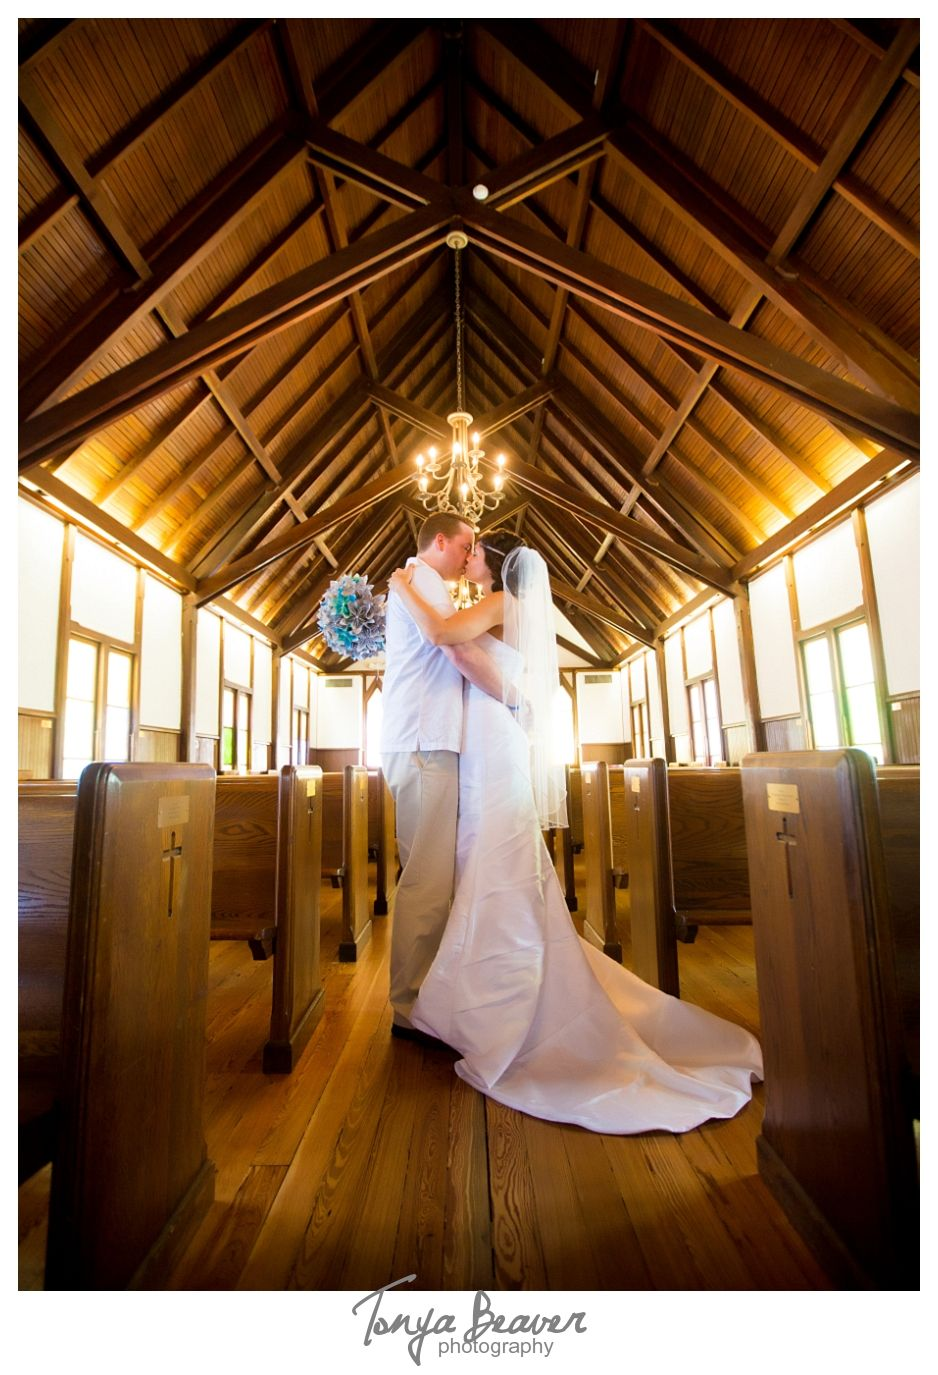 Tonya Beaver Photography; Historic church wedding; Jacksonville Beach elopement; beaches chapel; paper bouquet